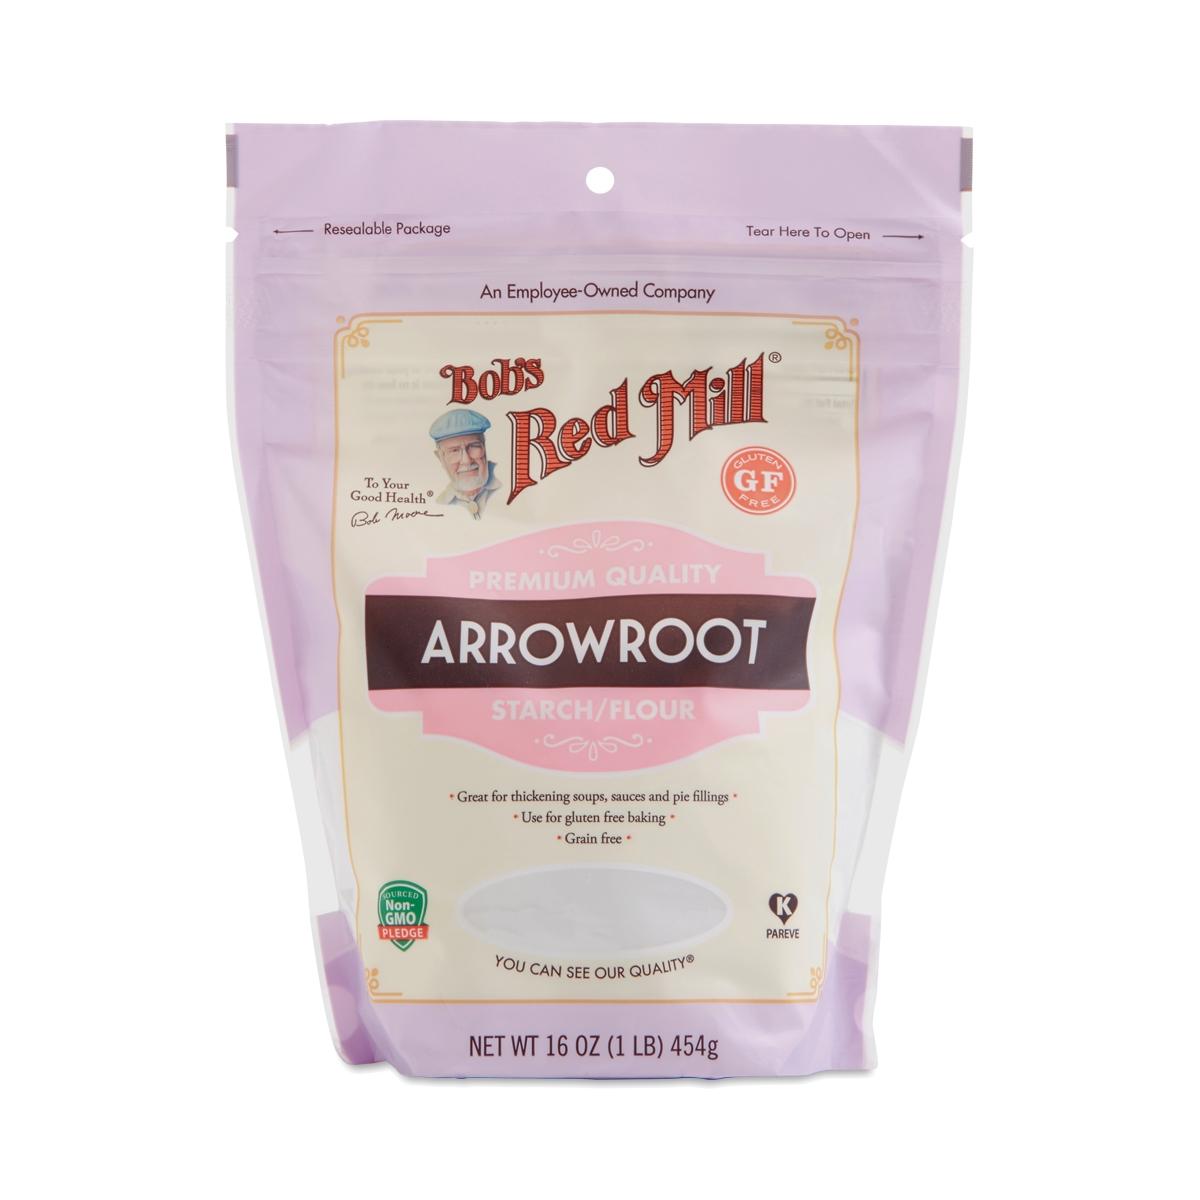 Arrowroot Starch / Flour